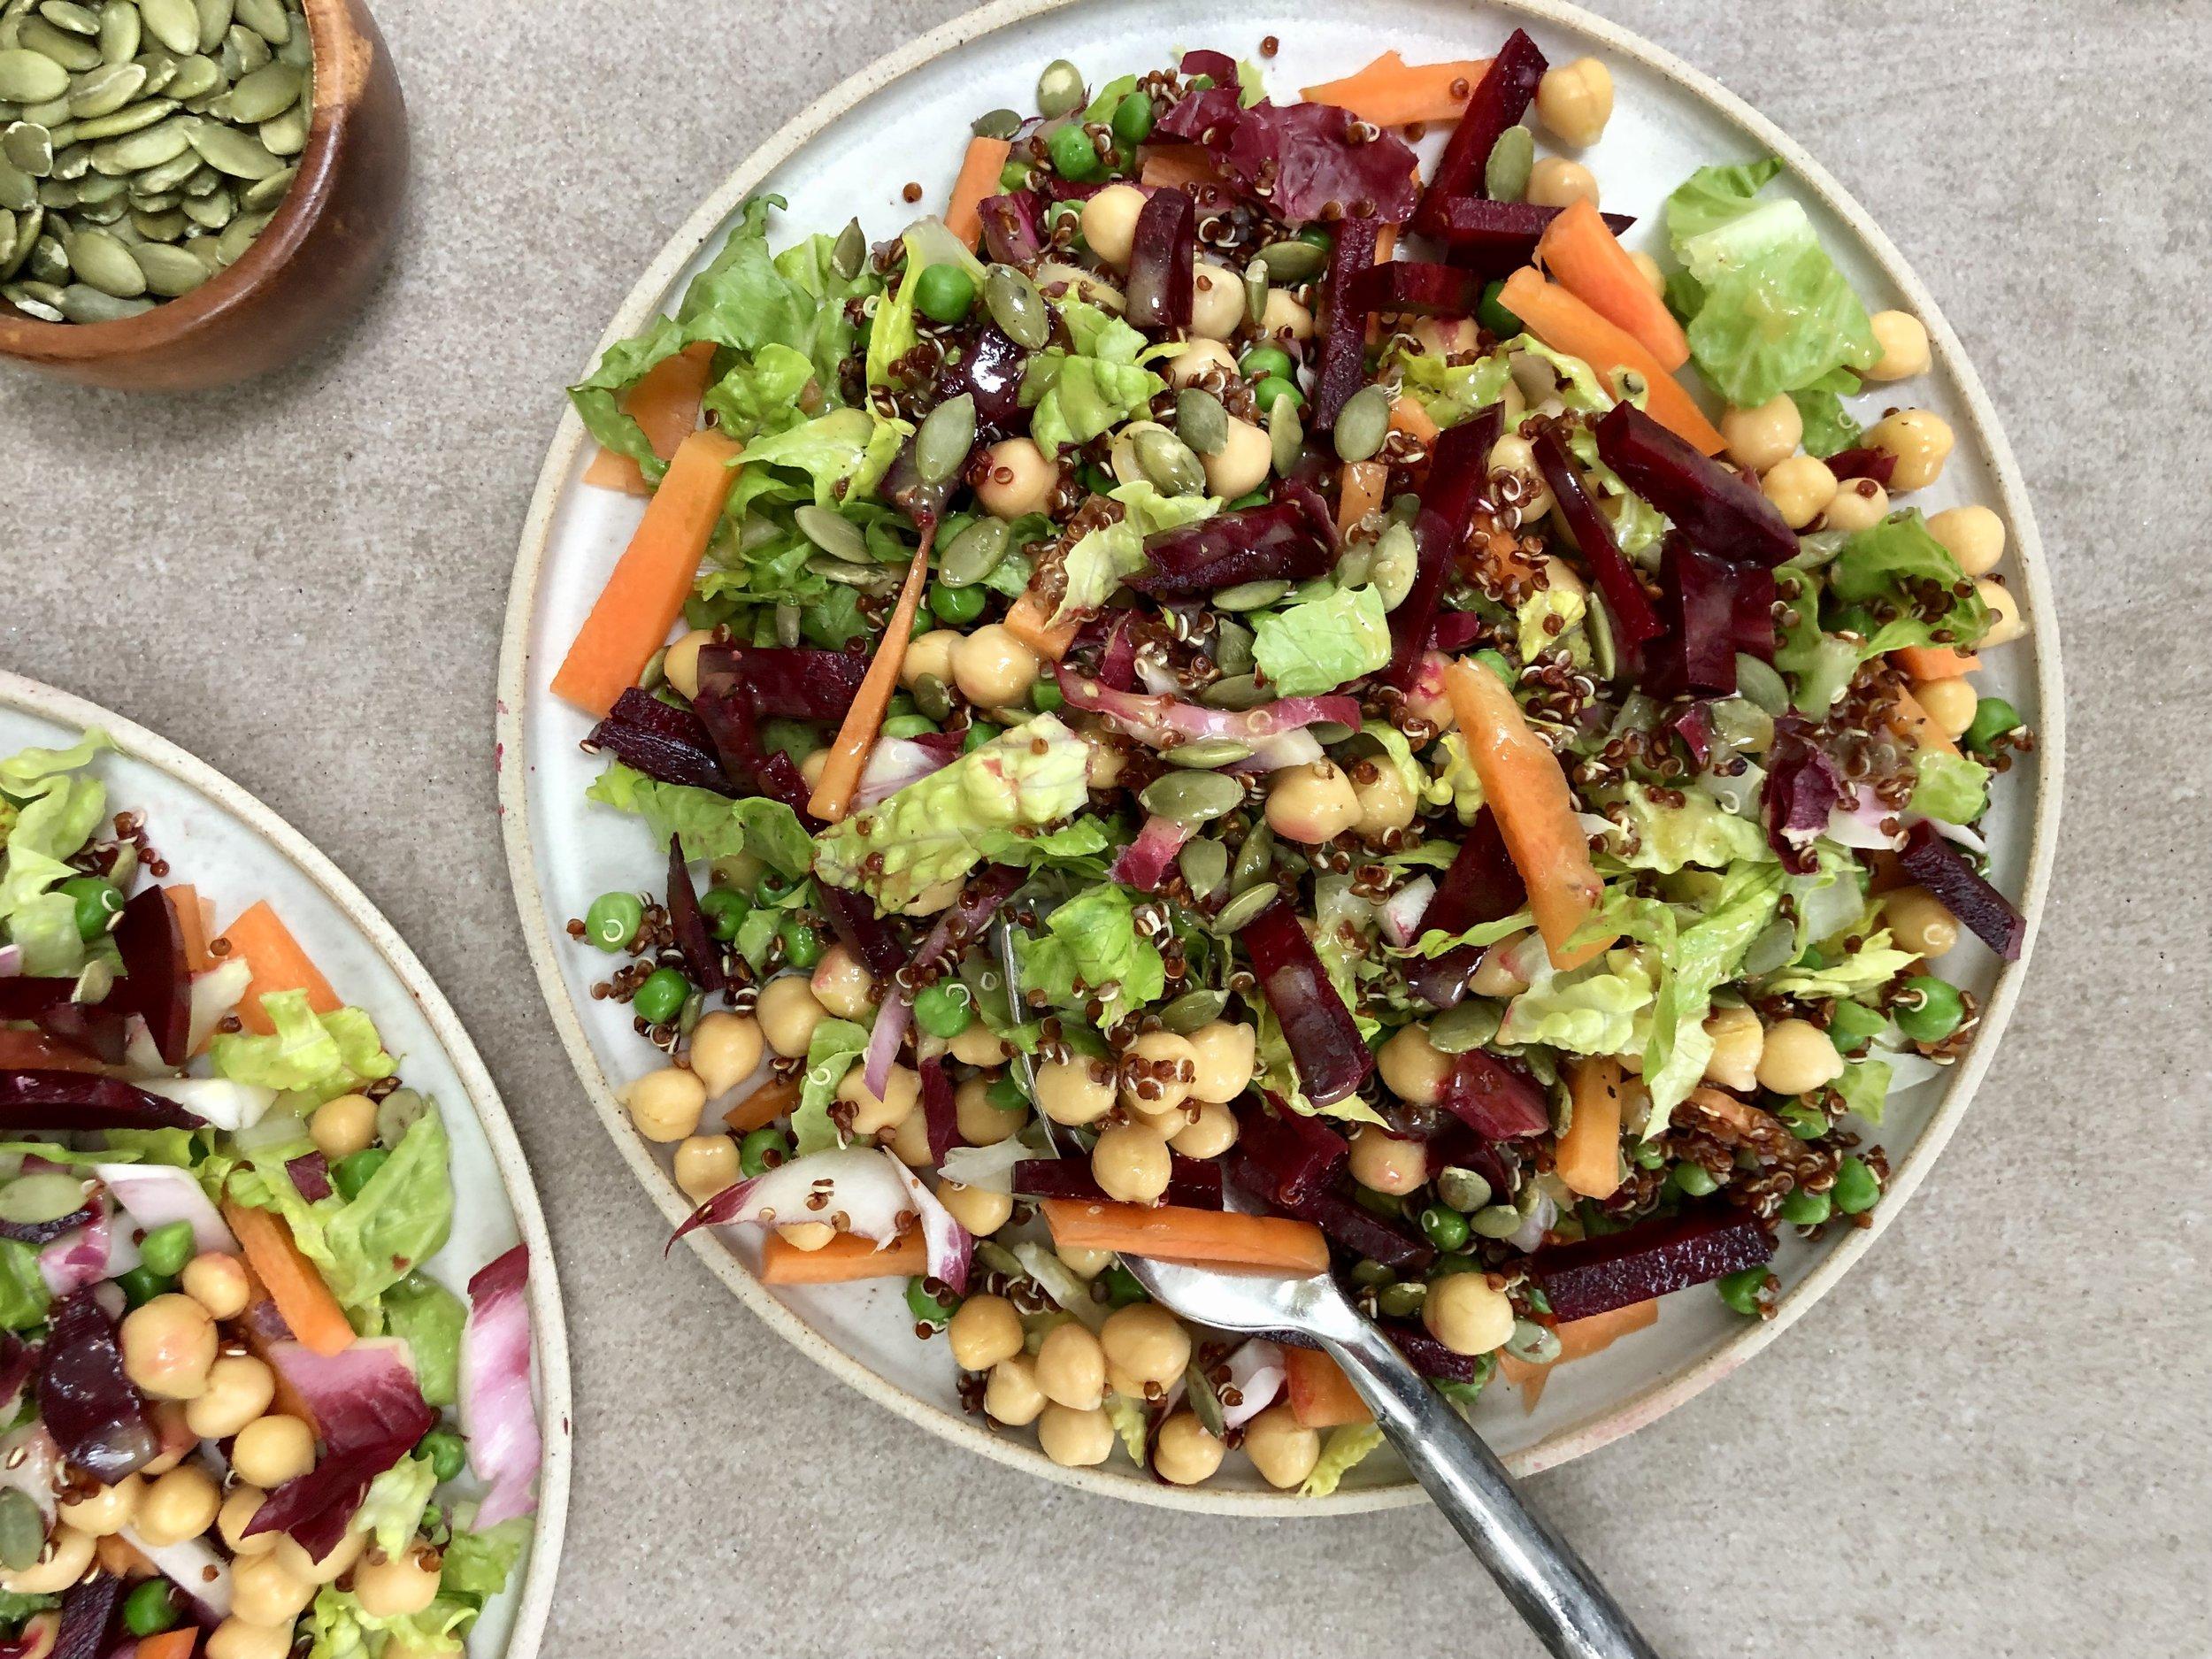 Rainbow Salad with Chickpeas and Quinoa